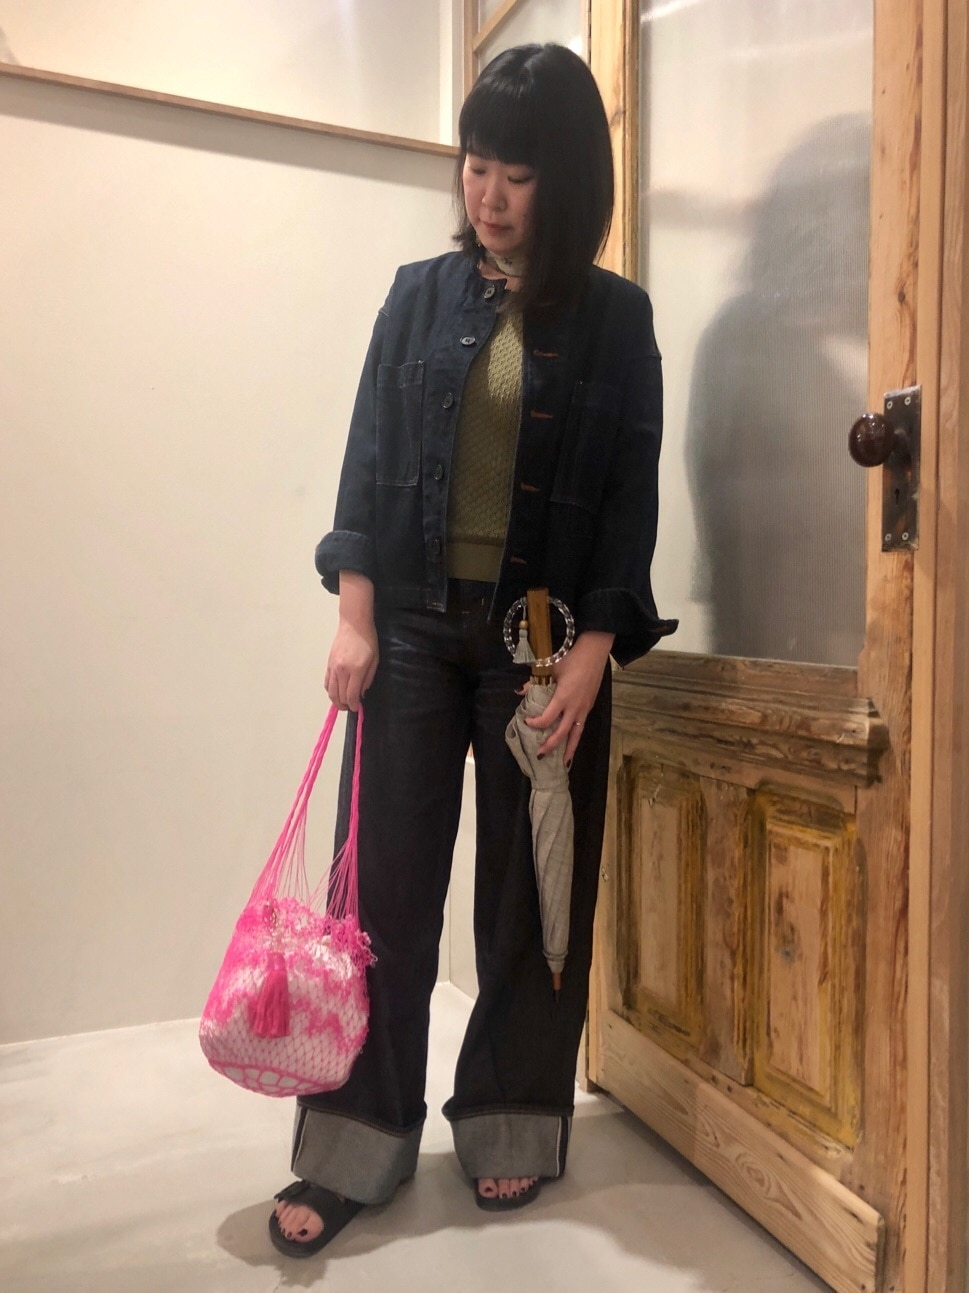 bulle de savon 渋谷スクランブルスクエア 身長:157cm 2020.06.16